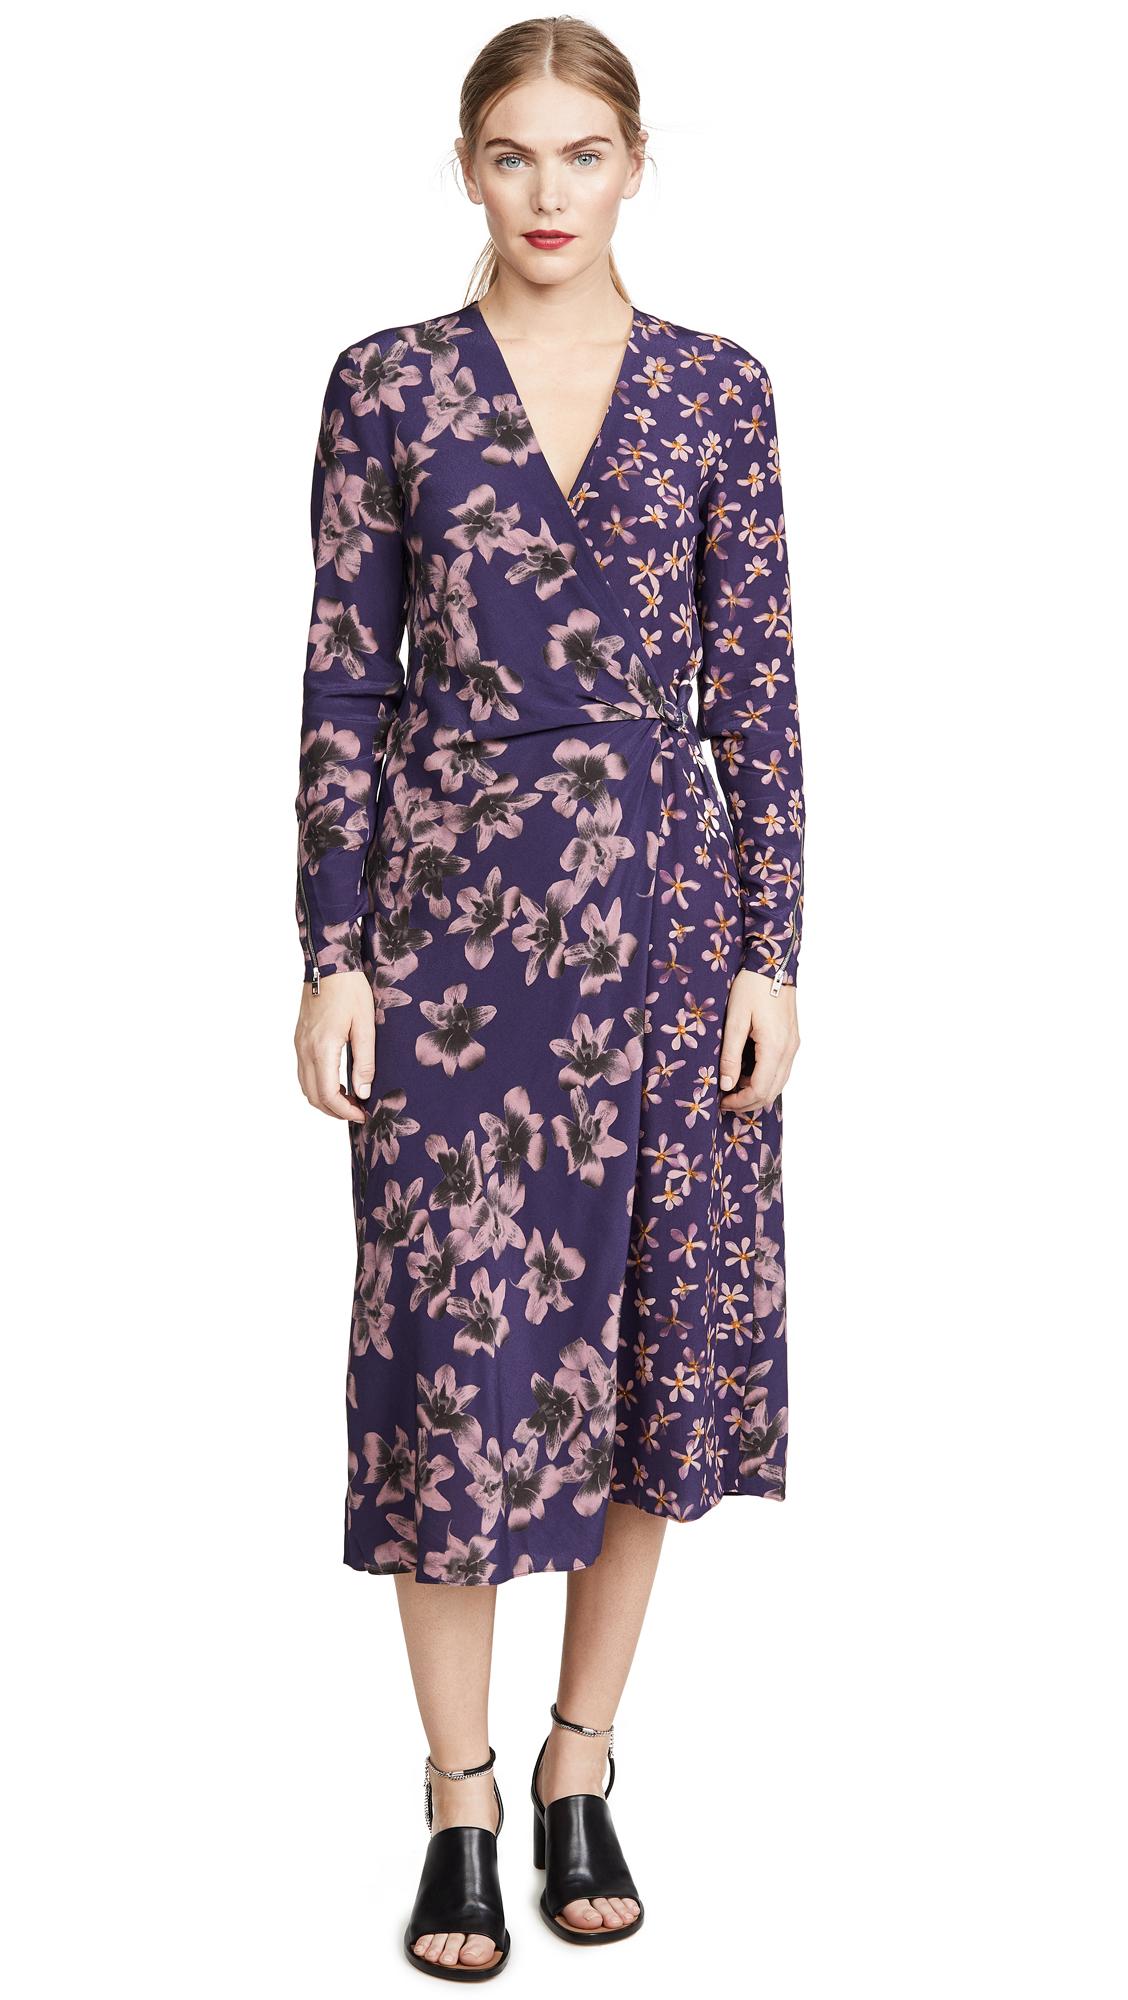 Buy Rag & Bone Odette Dress online beautiful Rag & Bone Clothing, Dresses